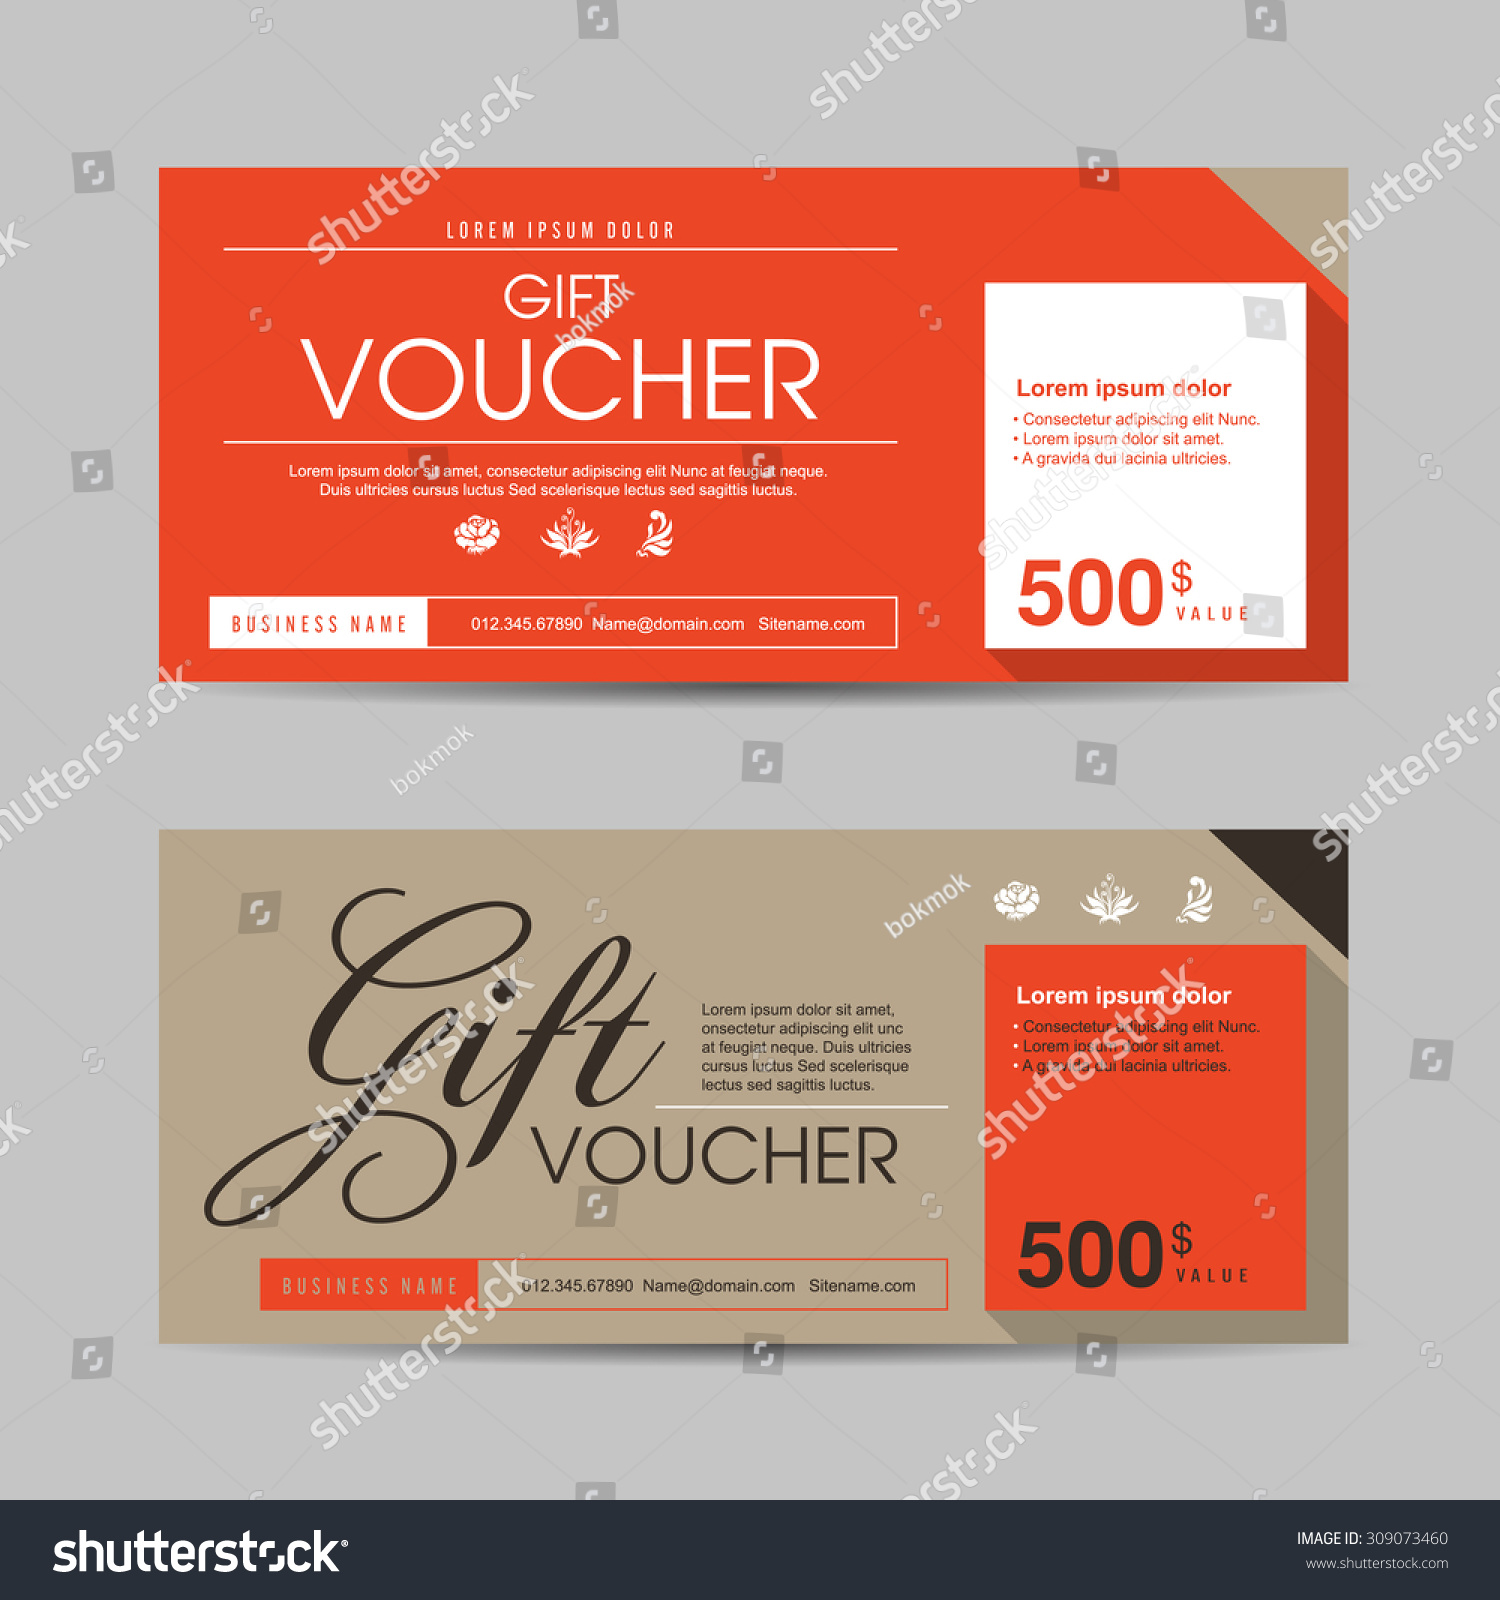 gift voucher layout - tvsputnik.tk